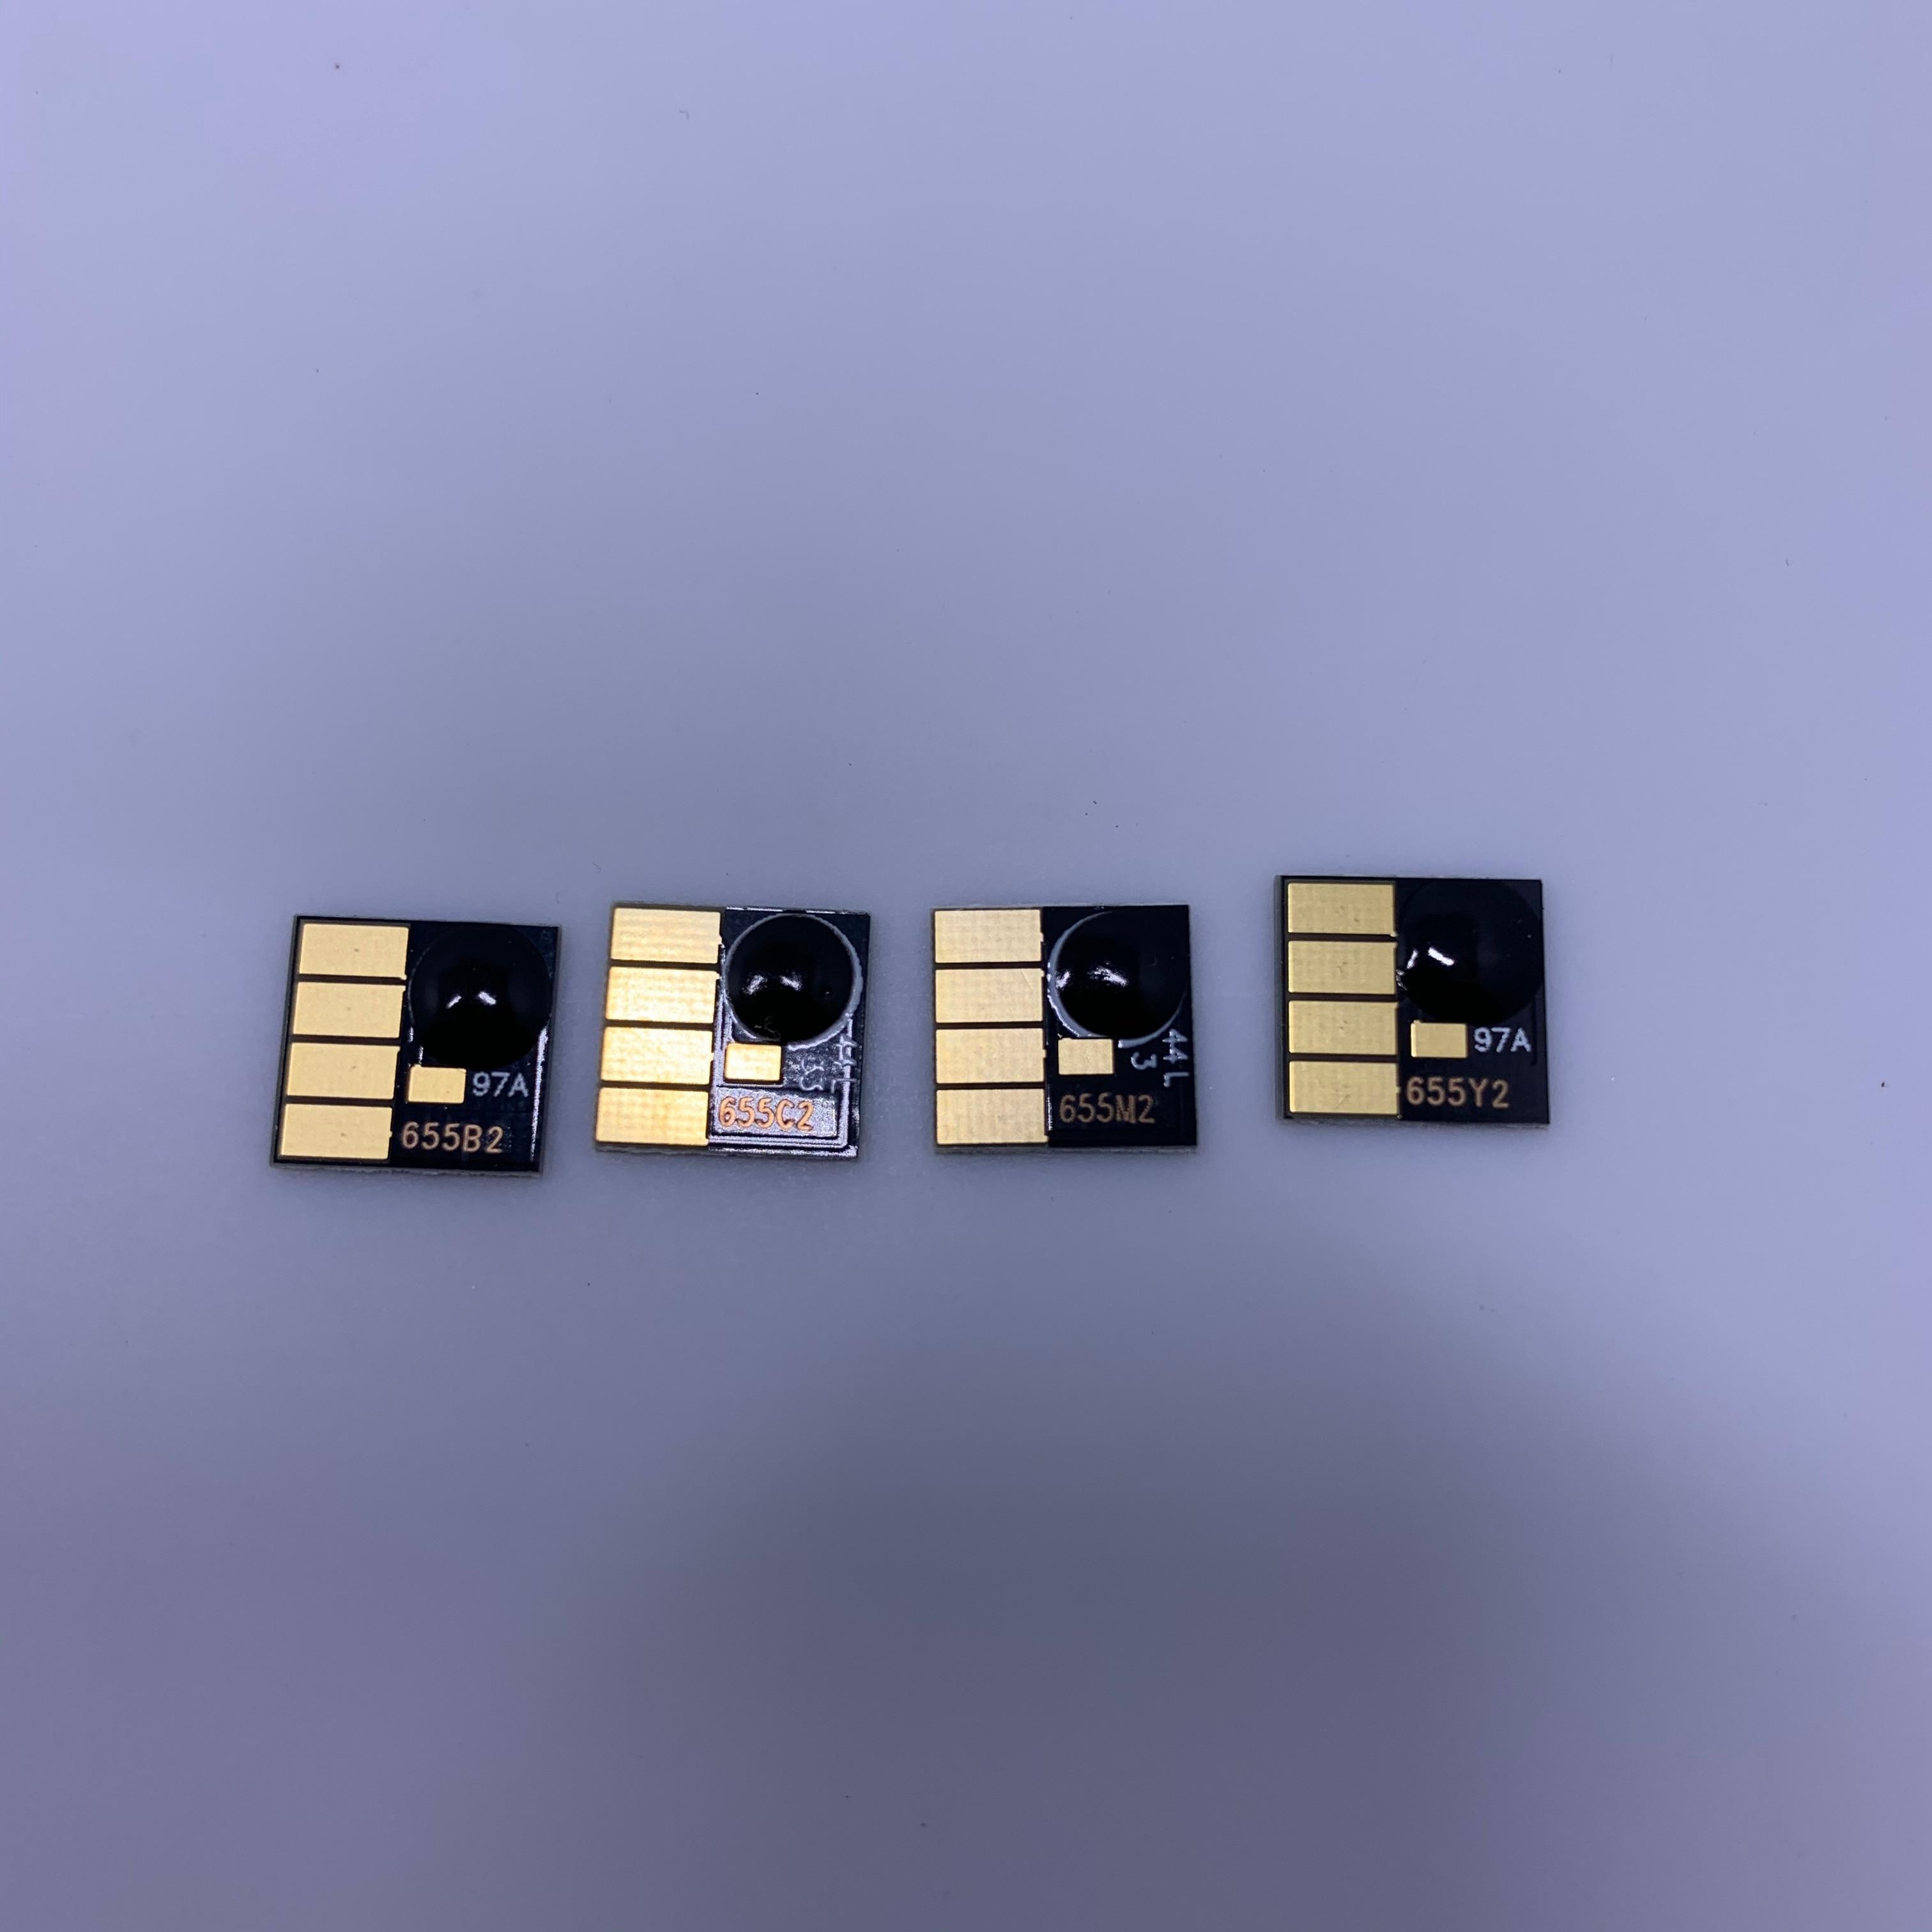 Yotat 4 pces chip permanente para hp655 hp655xl hp 655 para hp deskjet vantagem de tinta 3525/4615/4625/5525/6520/6525